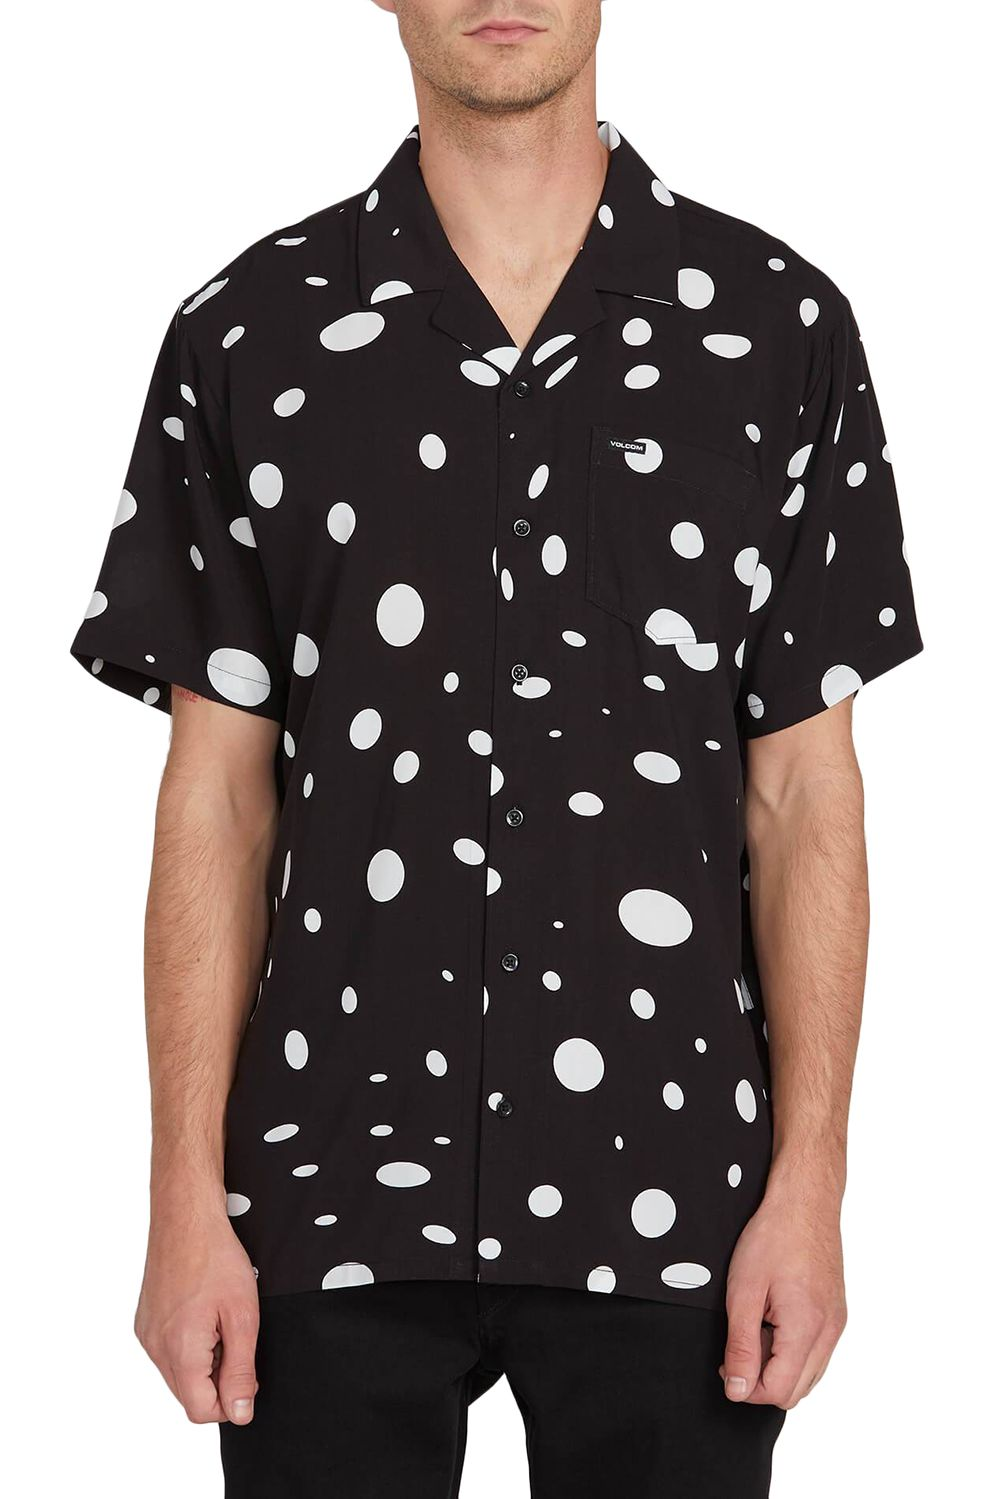 Camisa Volcom EMBERTONE S/S Black